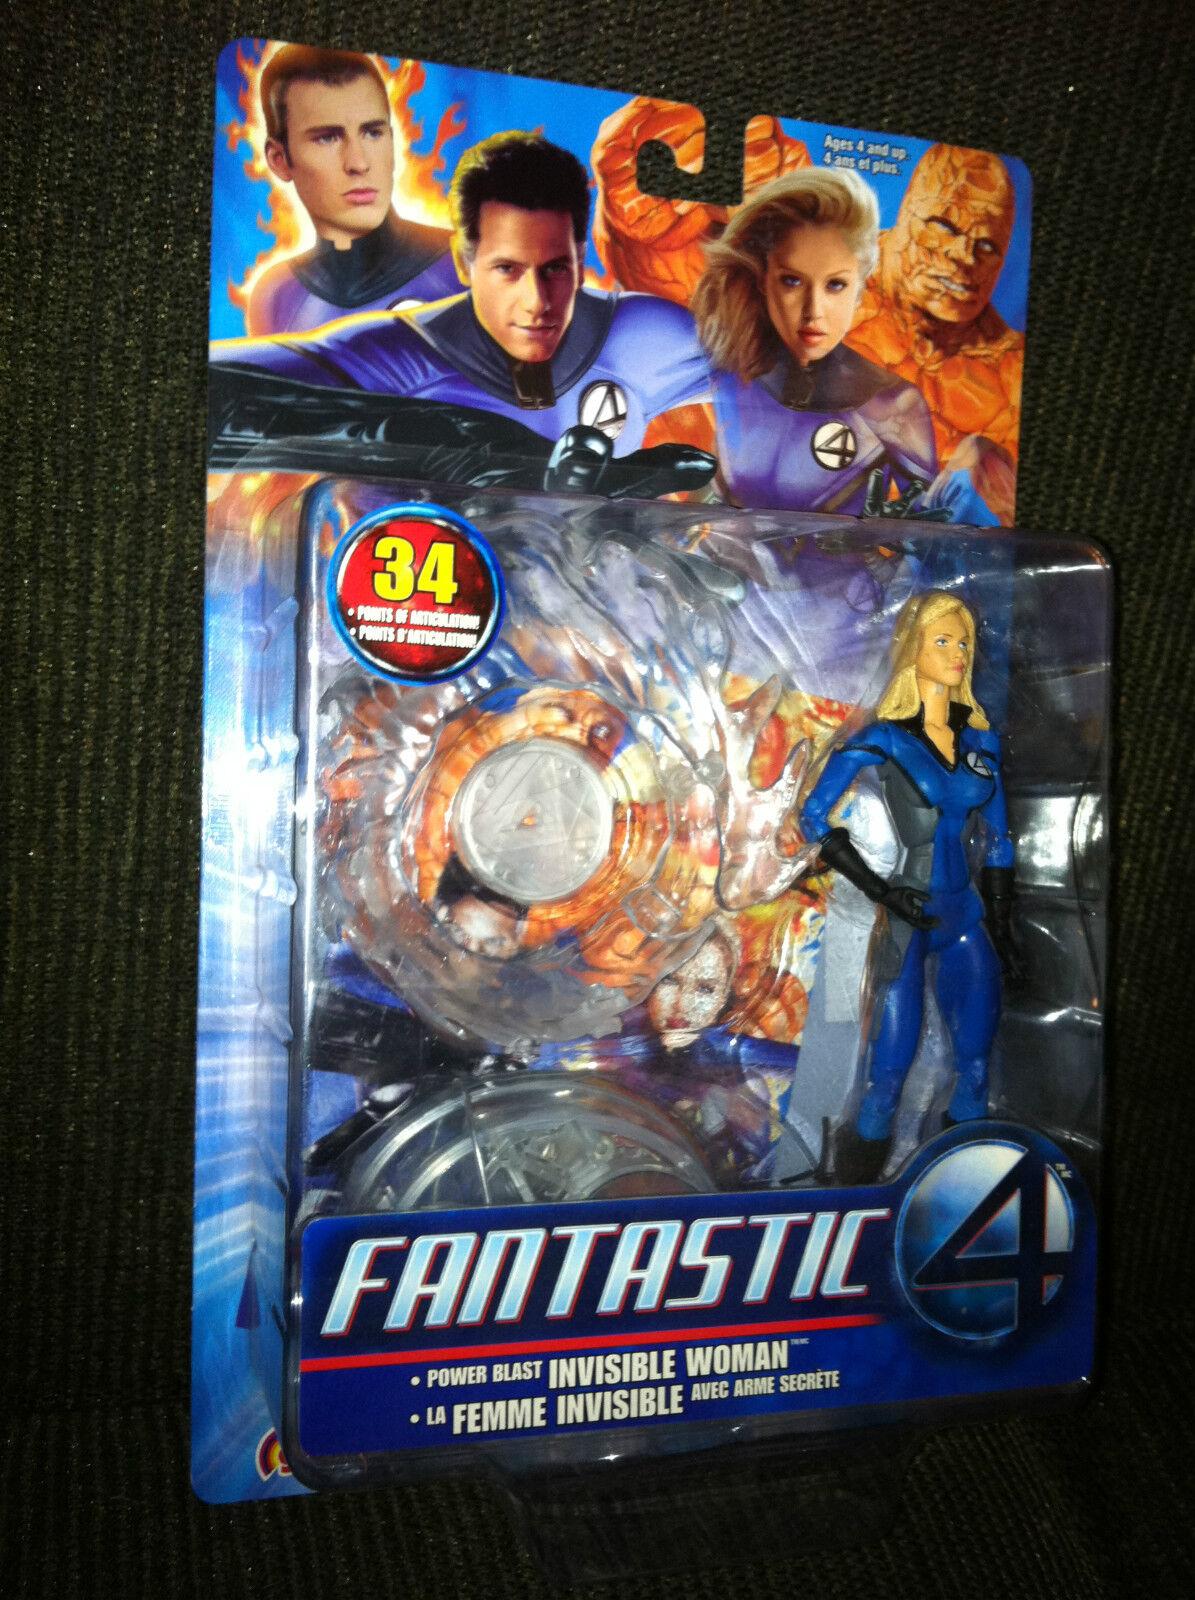 Fantastic 4 Marvel INVISIBLE WOMAN Jessica Alba  Solid  Variant Figure - Legends